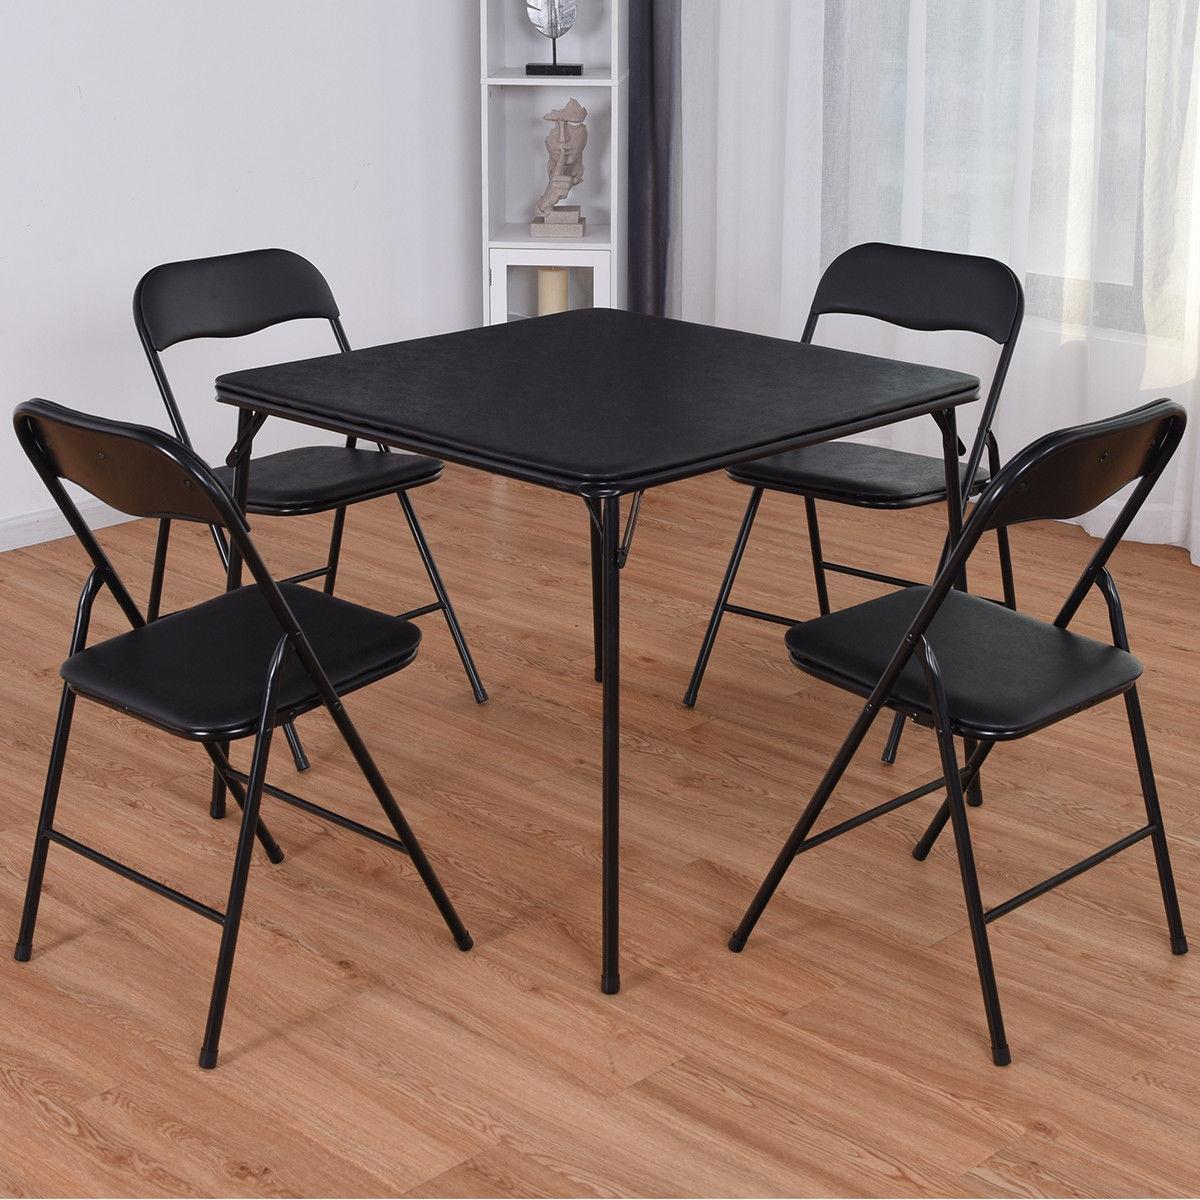 5 Piece Multi-Purpose Folding Dining KitchenTable Chair Set